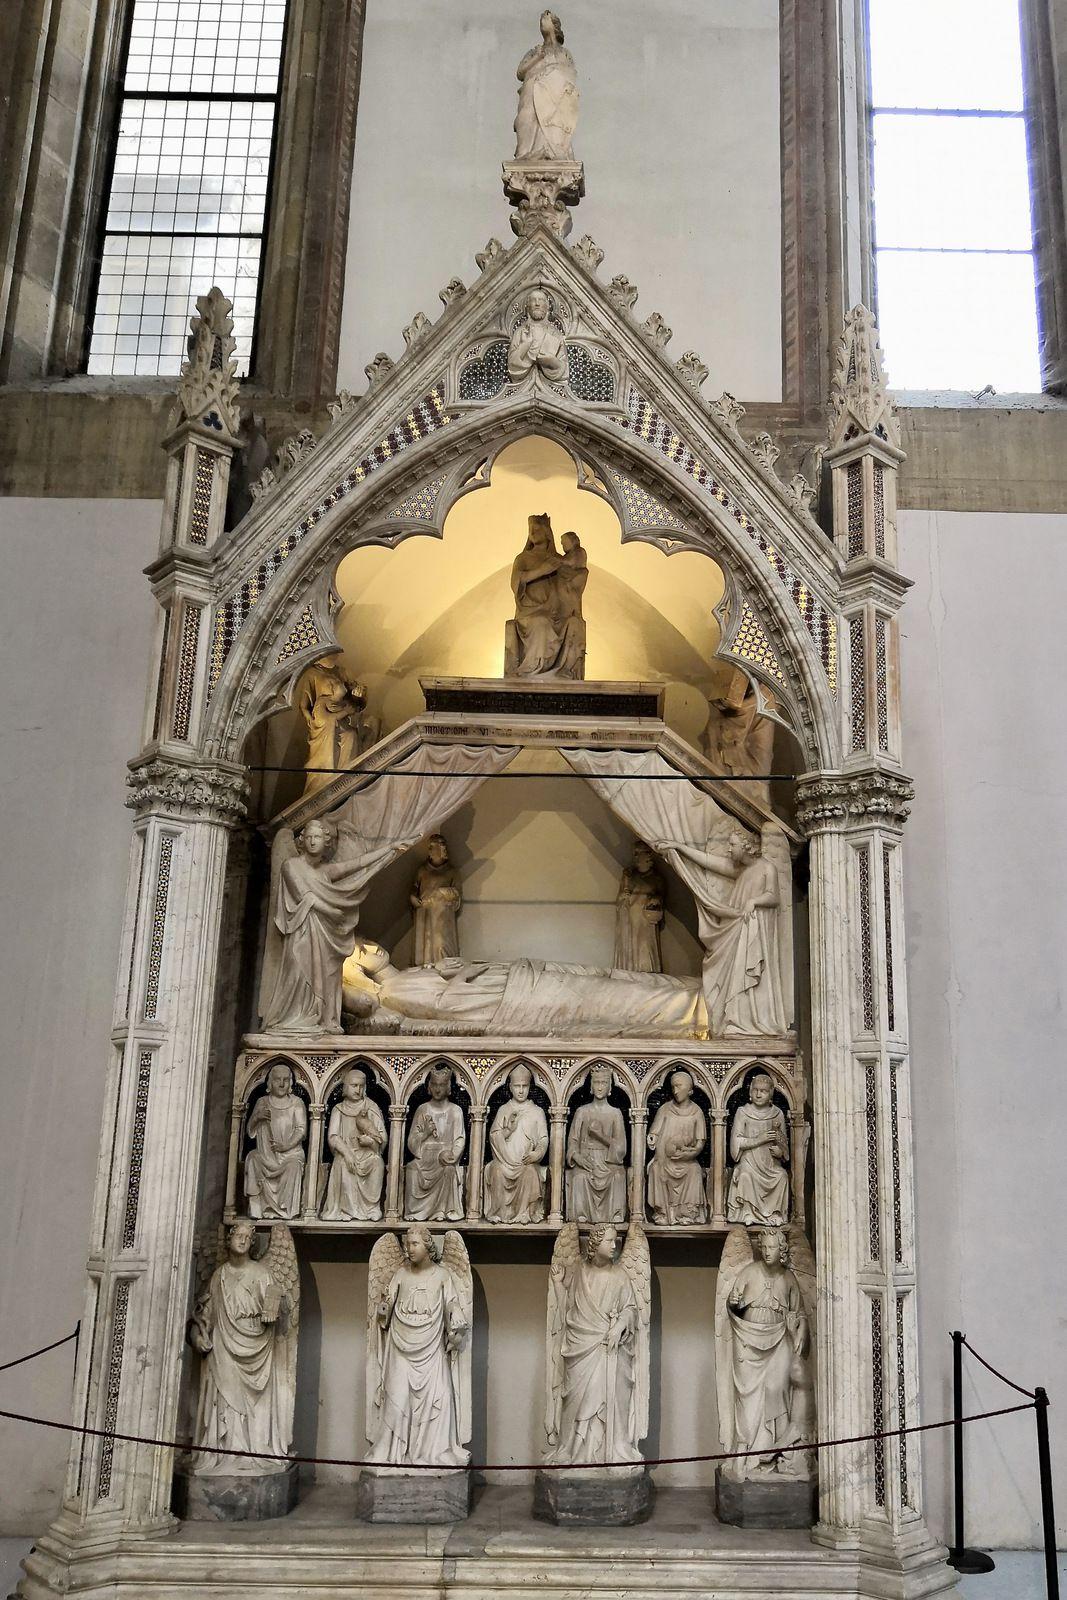 Tino di Camaino (Siena 1280, Napoli 1336), Monumento sepocrale di Maria d'Ungheria [Marie d'Anjou]